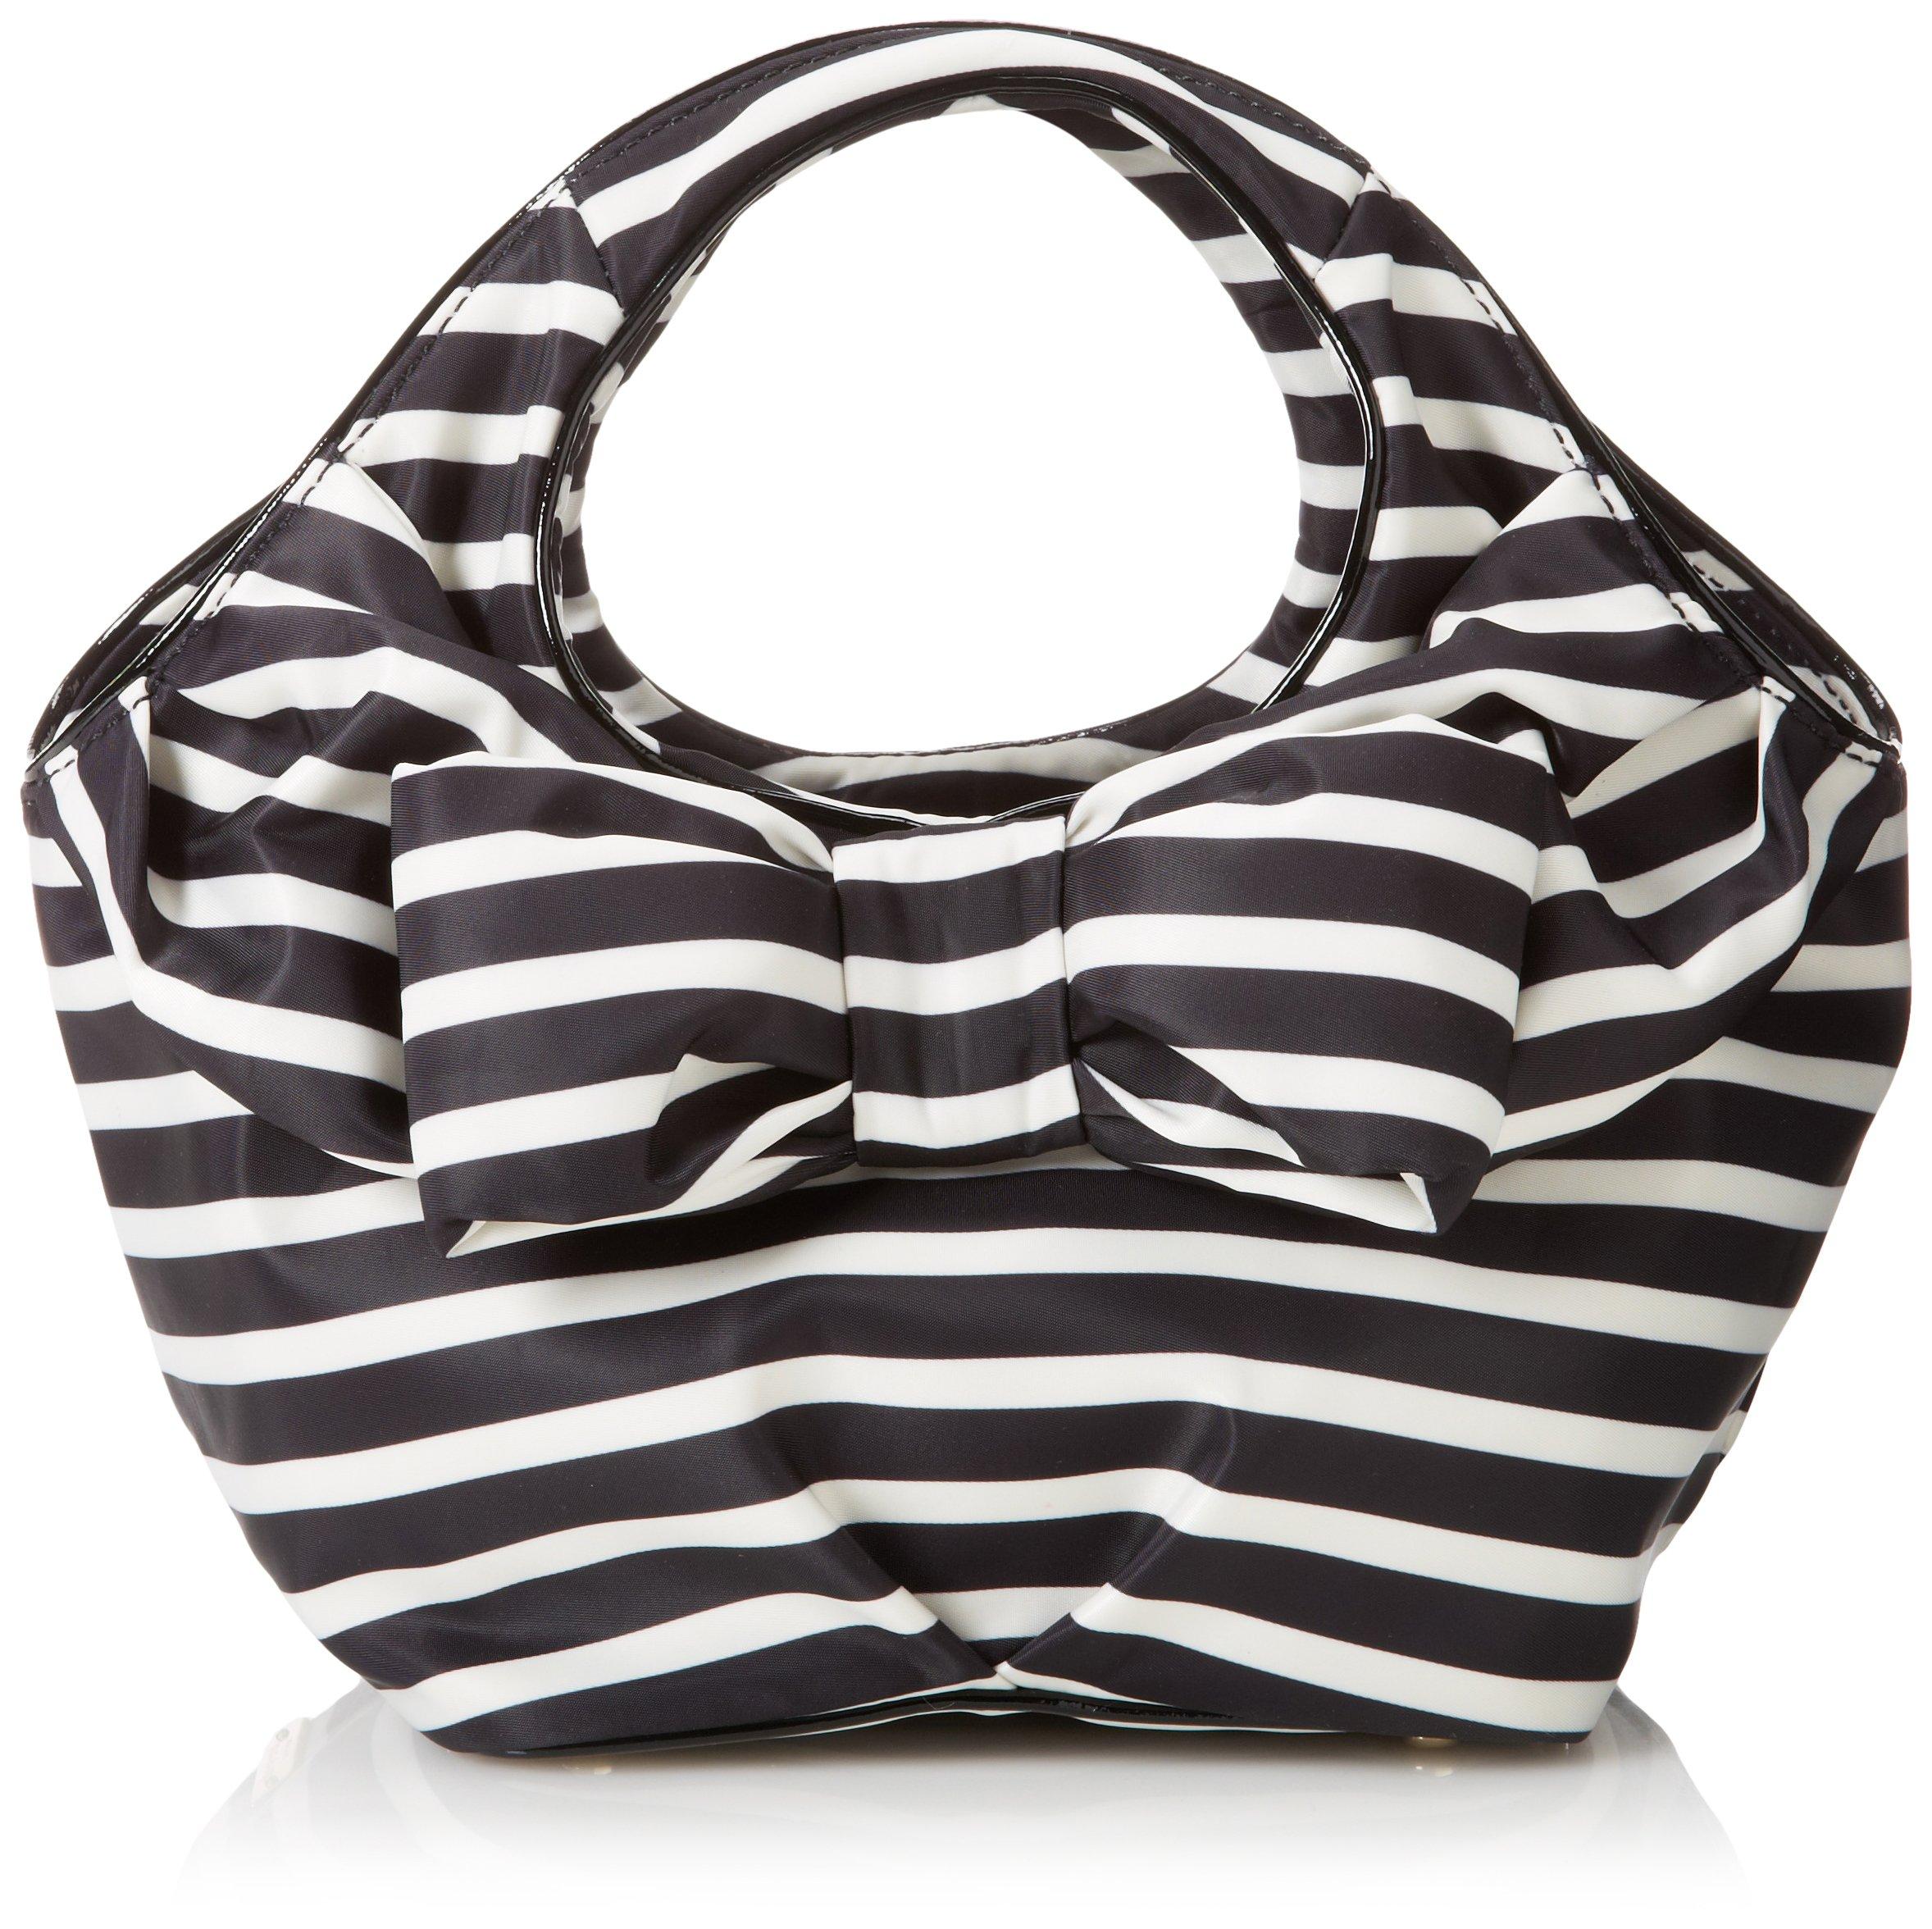 kate spade new york Nylon Stripe Tate Top Handle Bag,Black/Cream,One Size